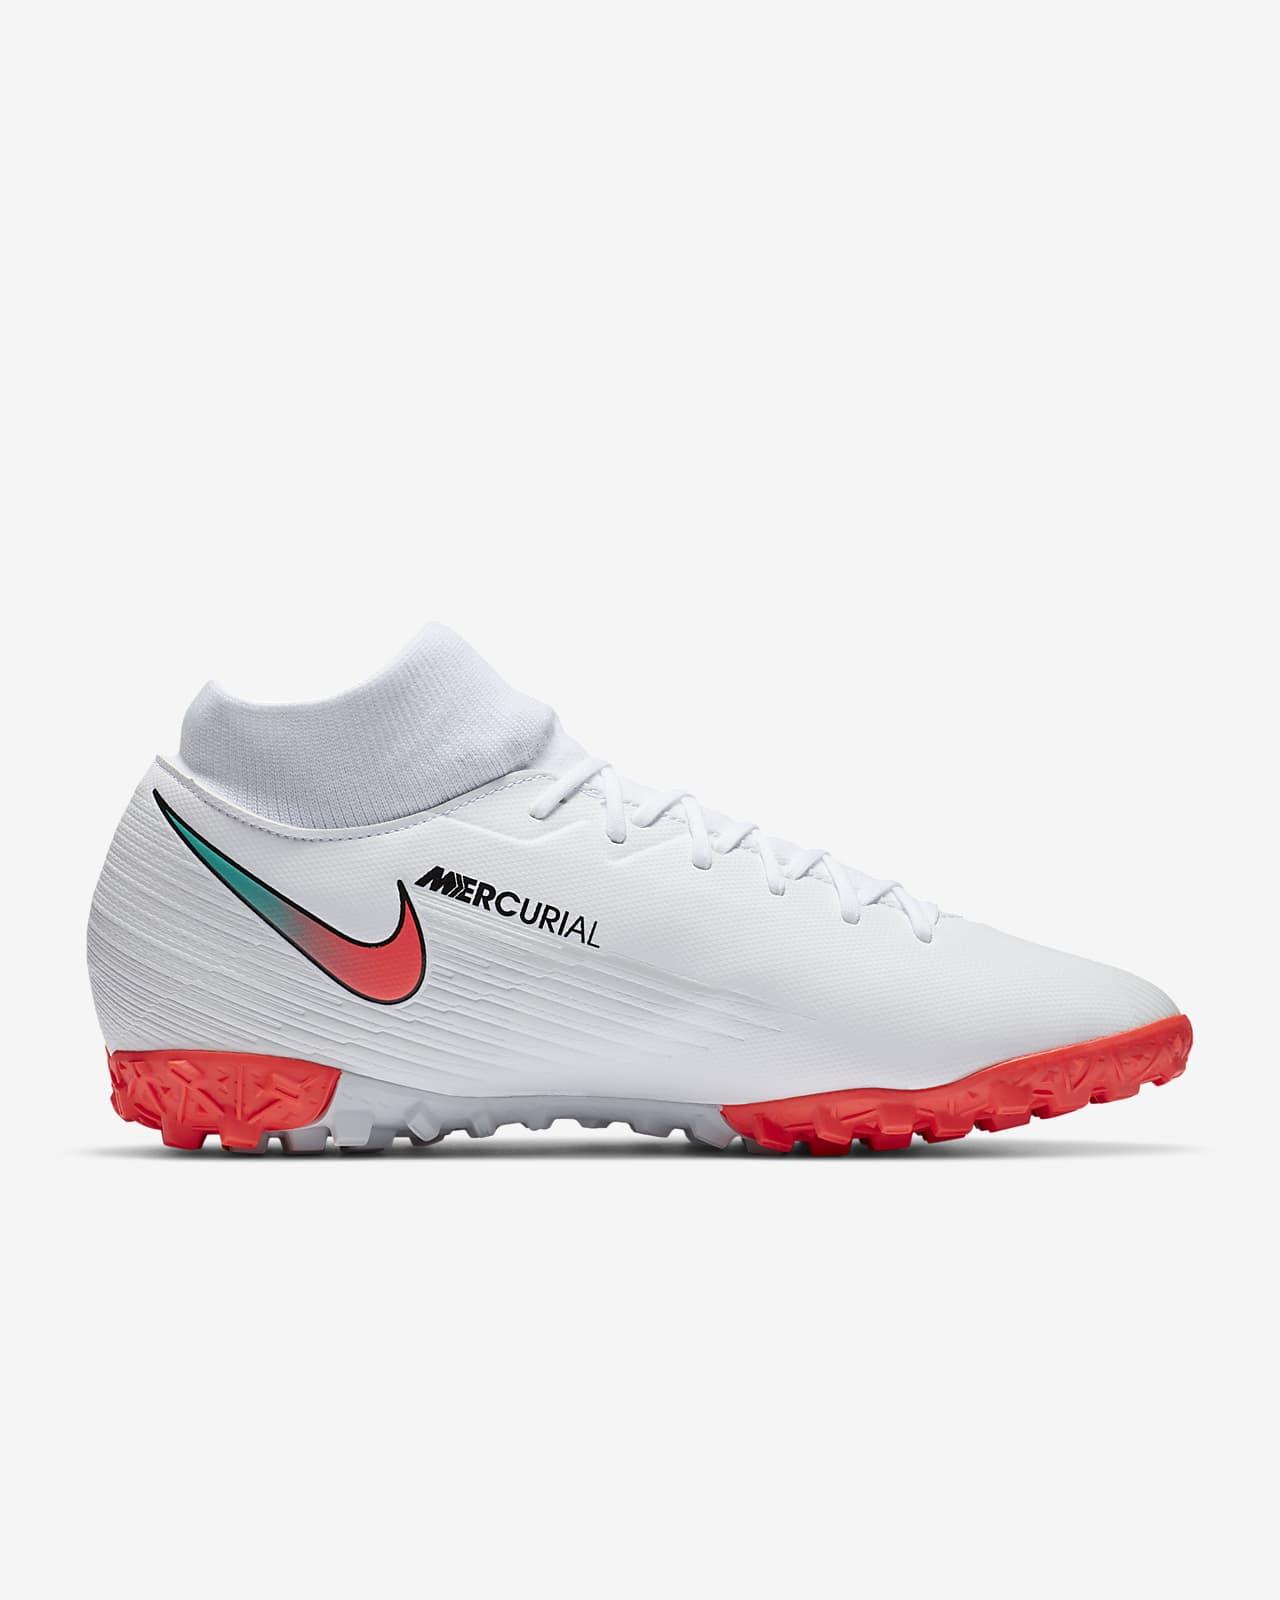 Rectángulo tos Plano  Calzado de fútbol Nike MercurialX Superfly 7 Academy para terreno  artificial. Nike.com